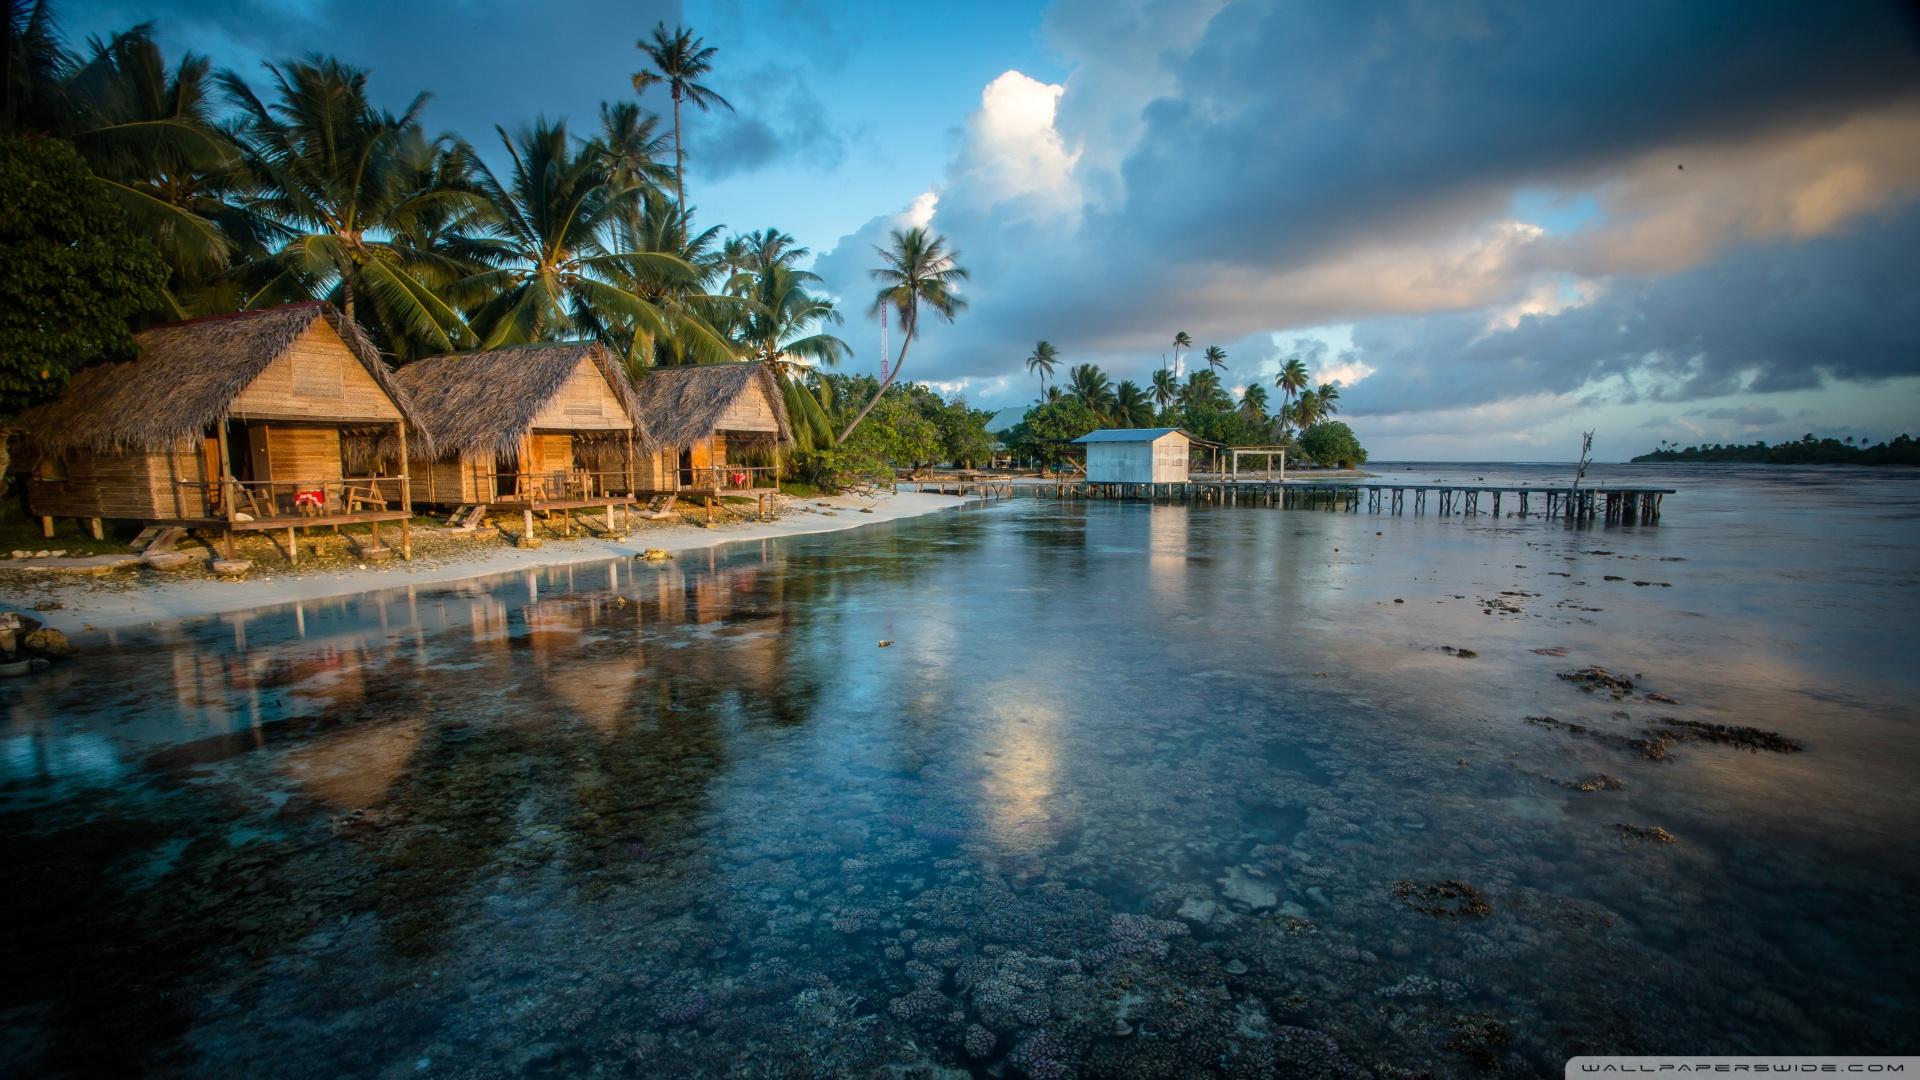 bungalows_on_the_reef_french_polynesia-wallpaper-1920x1080